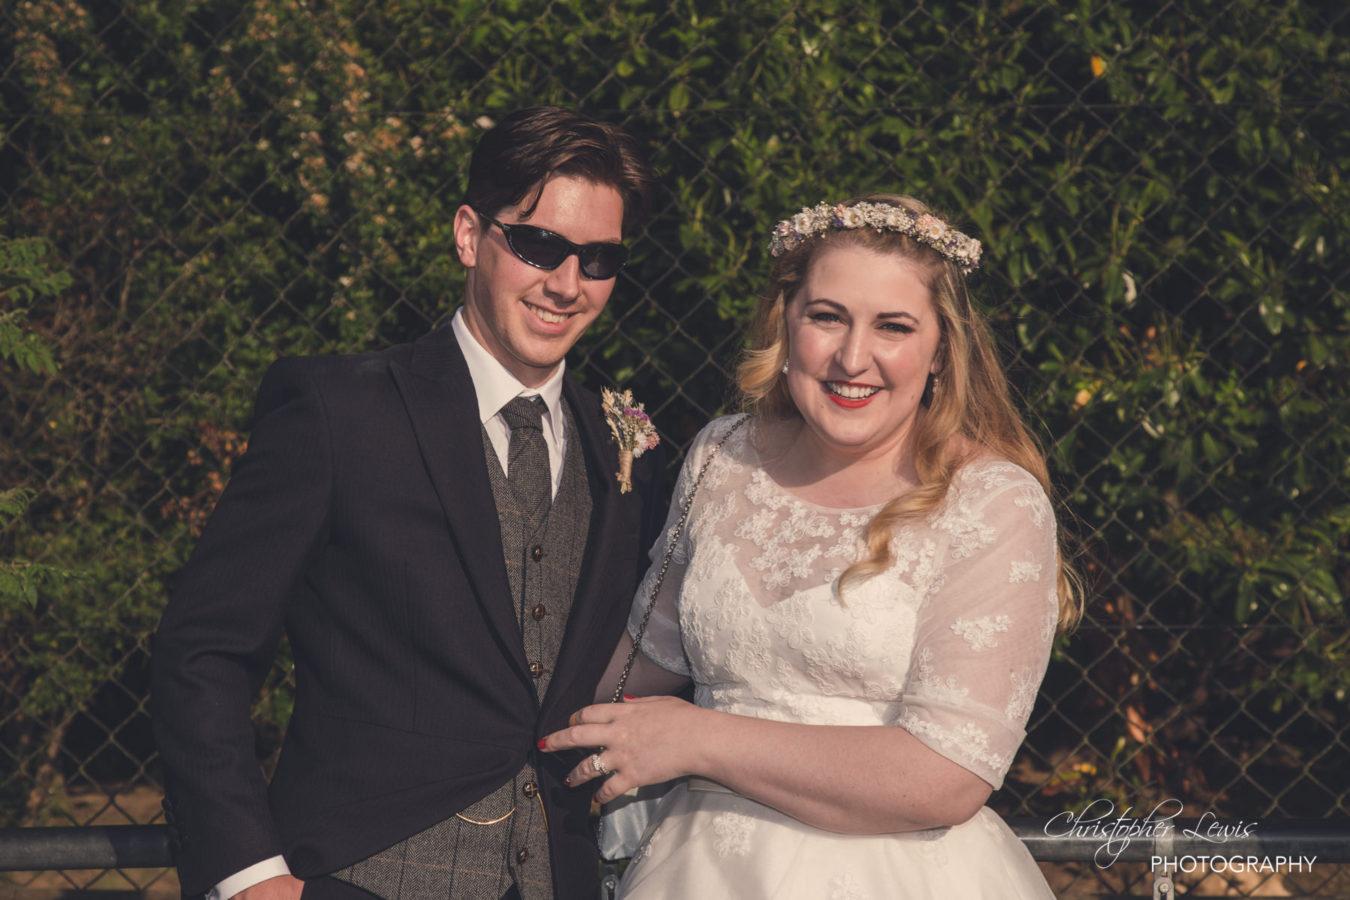 Chester-Zoo-Wedding-172